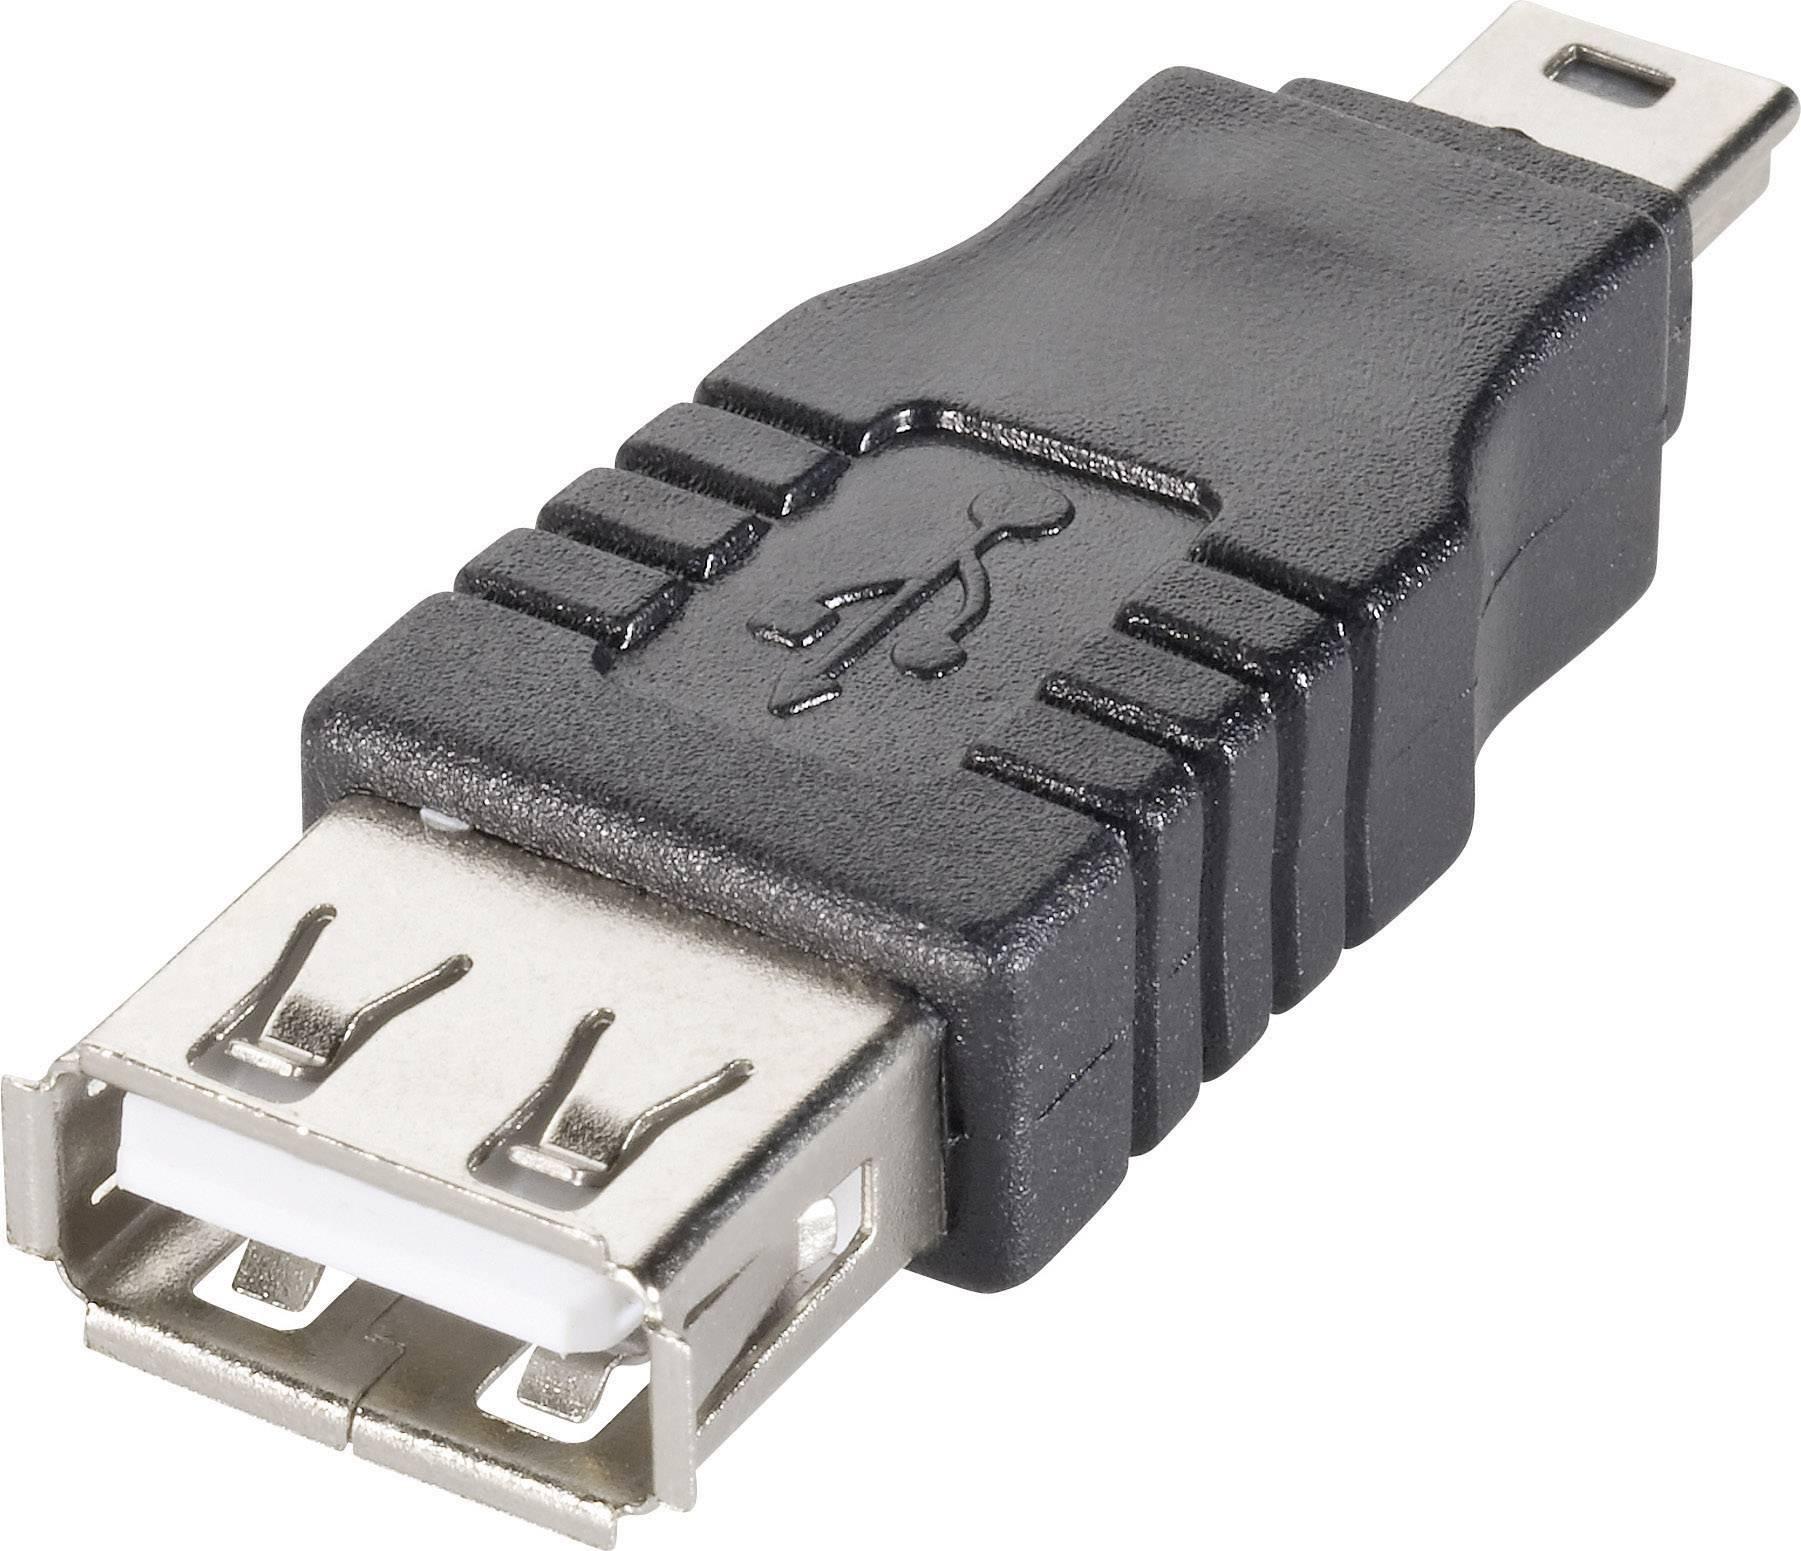 USB adaptér USB 2.0 Goobay 50970 0 m, čierna